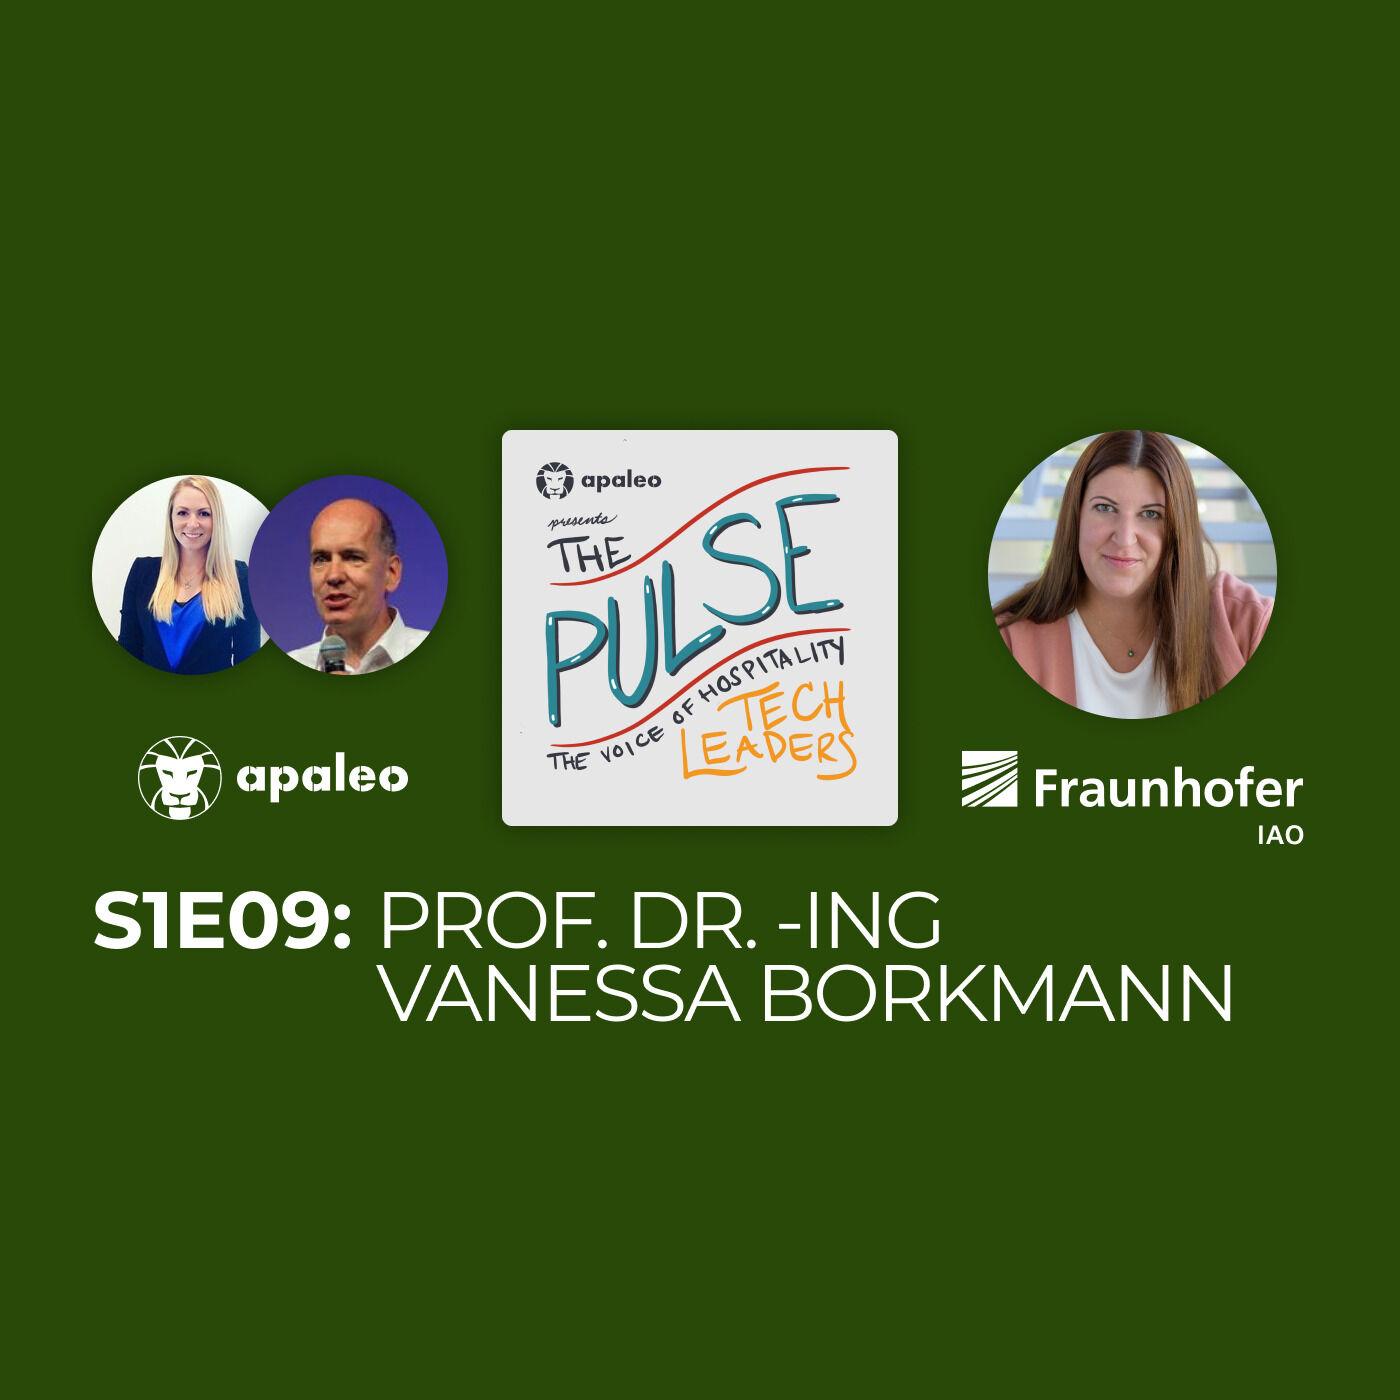 """The Future of Hospitality"" Fraunhofer IAO's Prof. Dr.-Ing. Vanessa Borkmann"